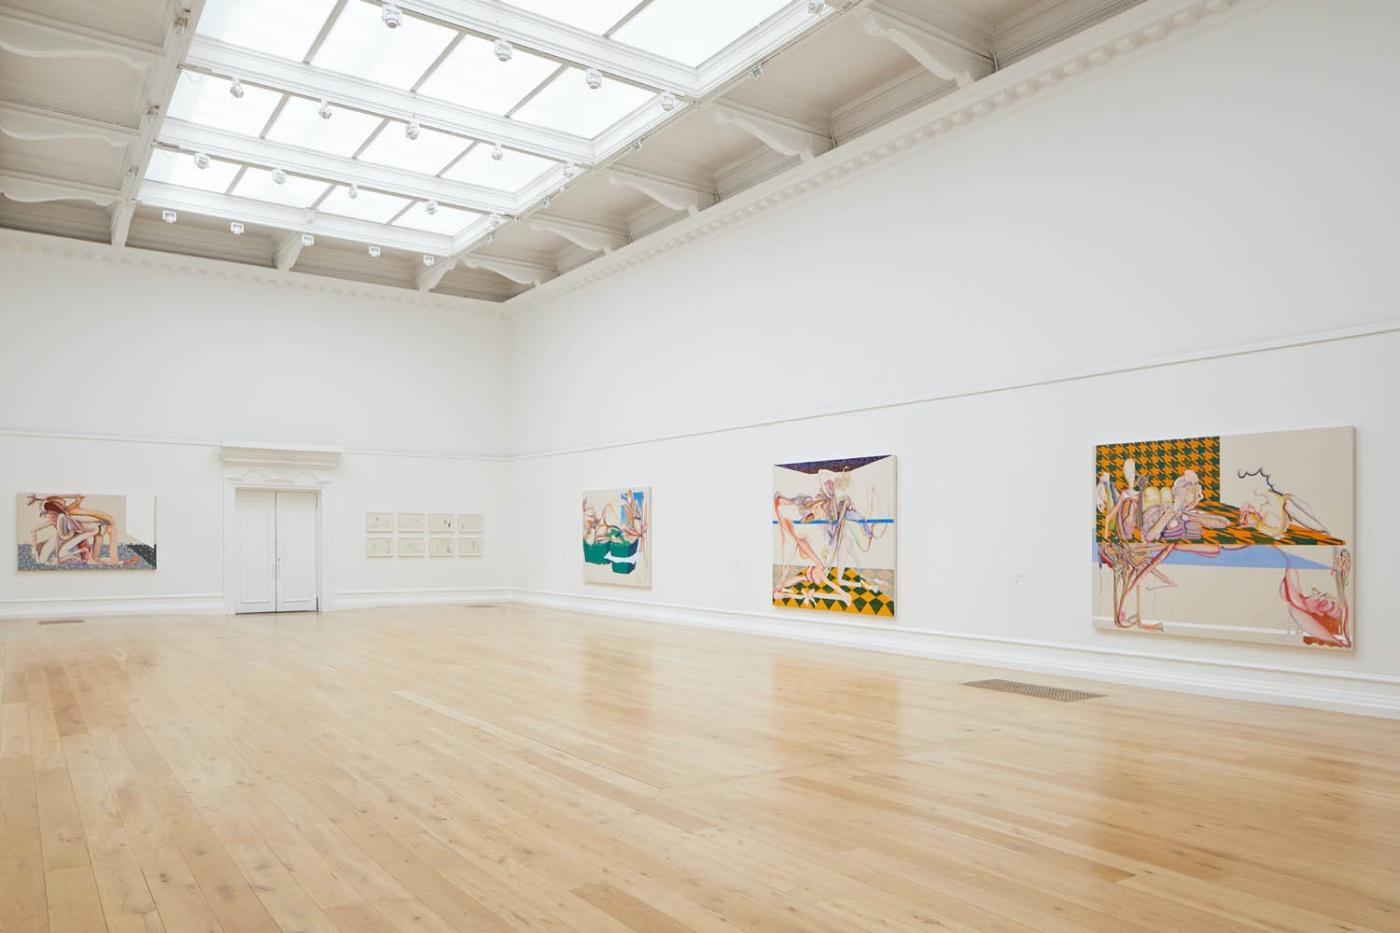 South London Gallery Christina Quarles 4